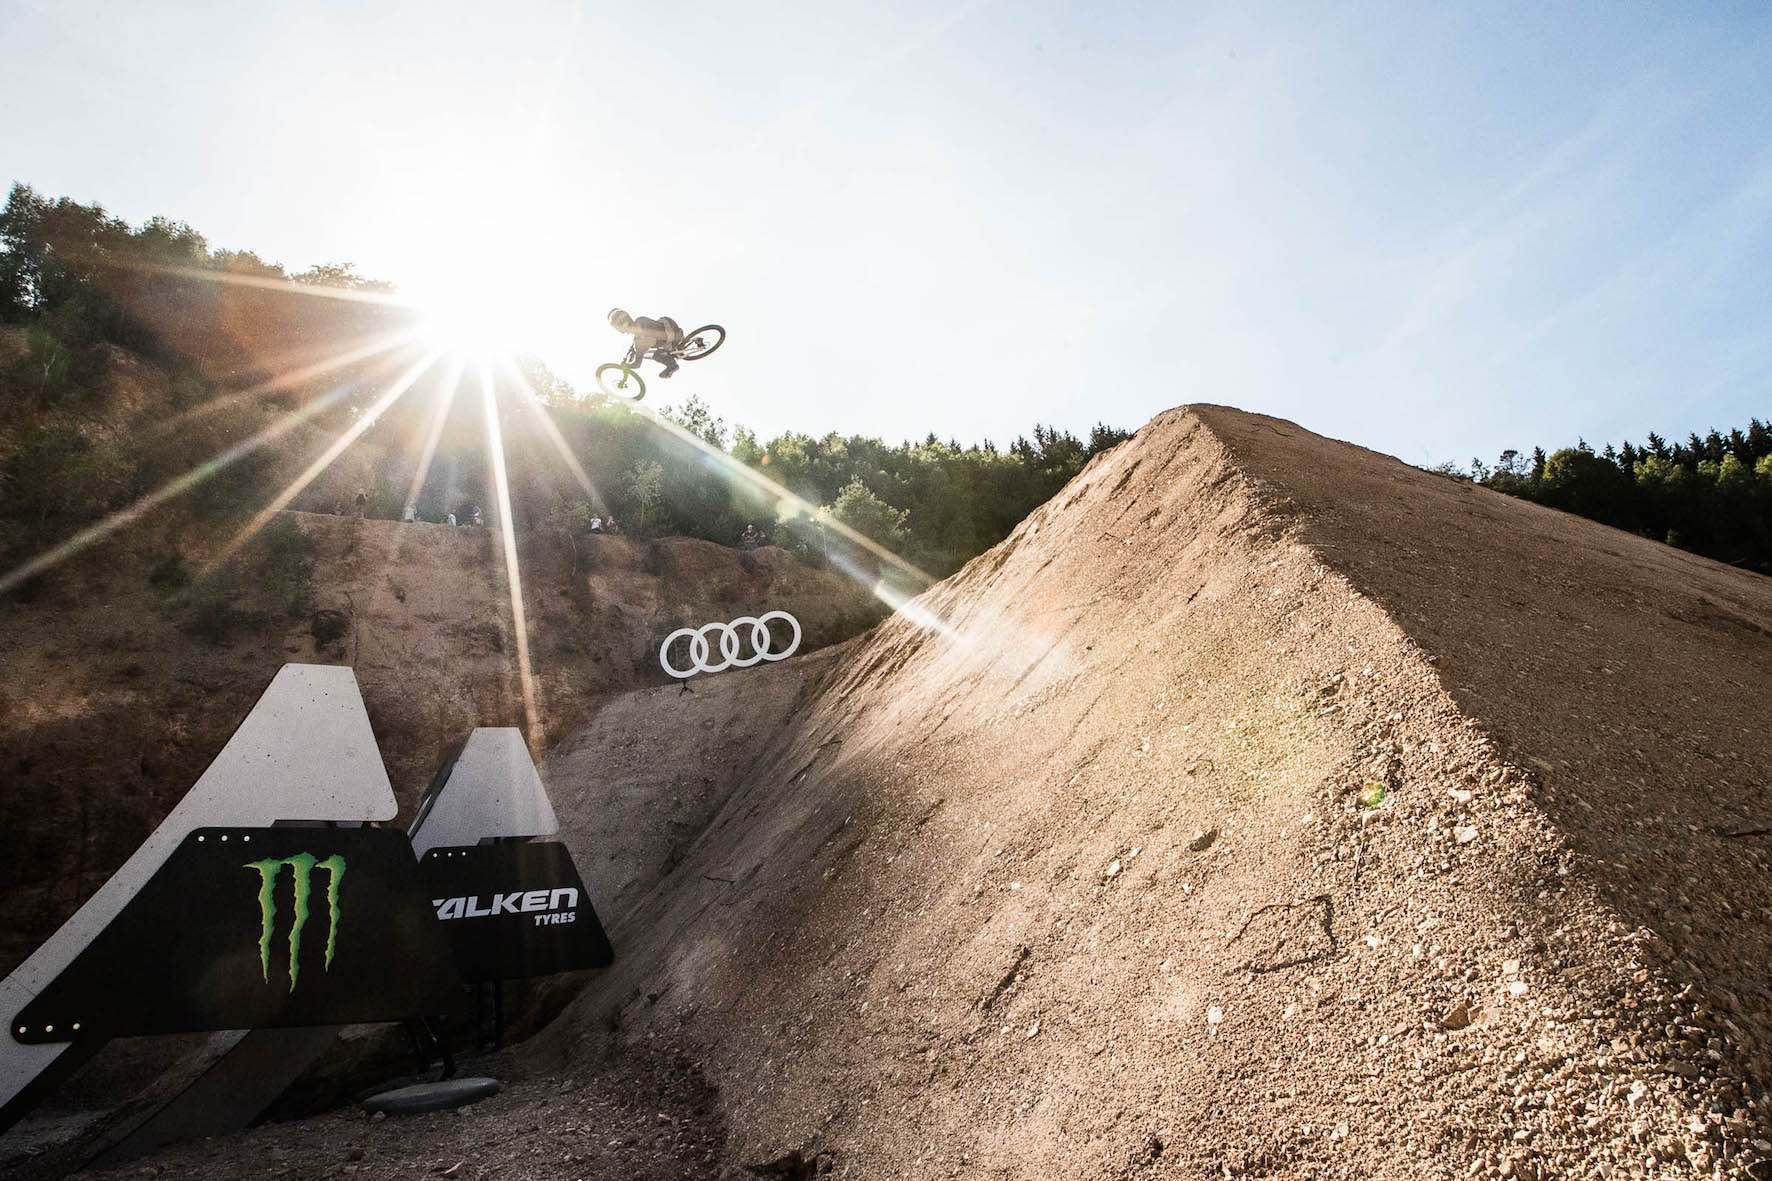 We interview freeride MTB rider, Patrick Schweika